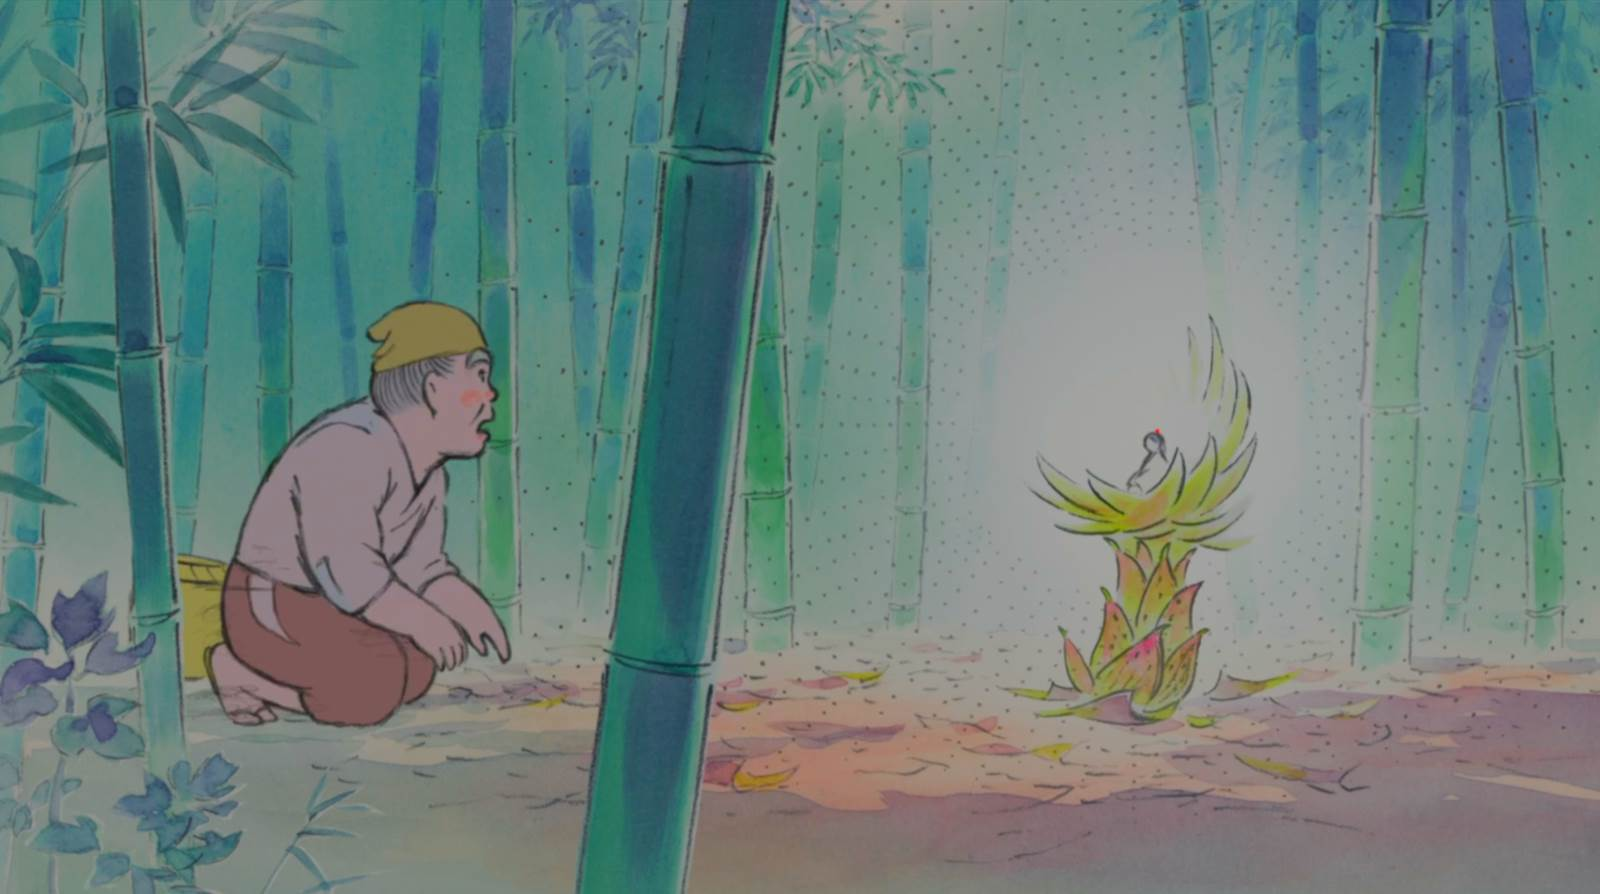 Kaguya-hime no Monogatari, Princess Kaguya is found inside a bamboo shoot